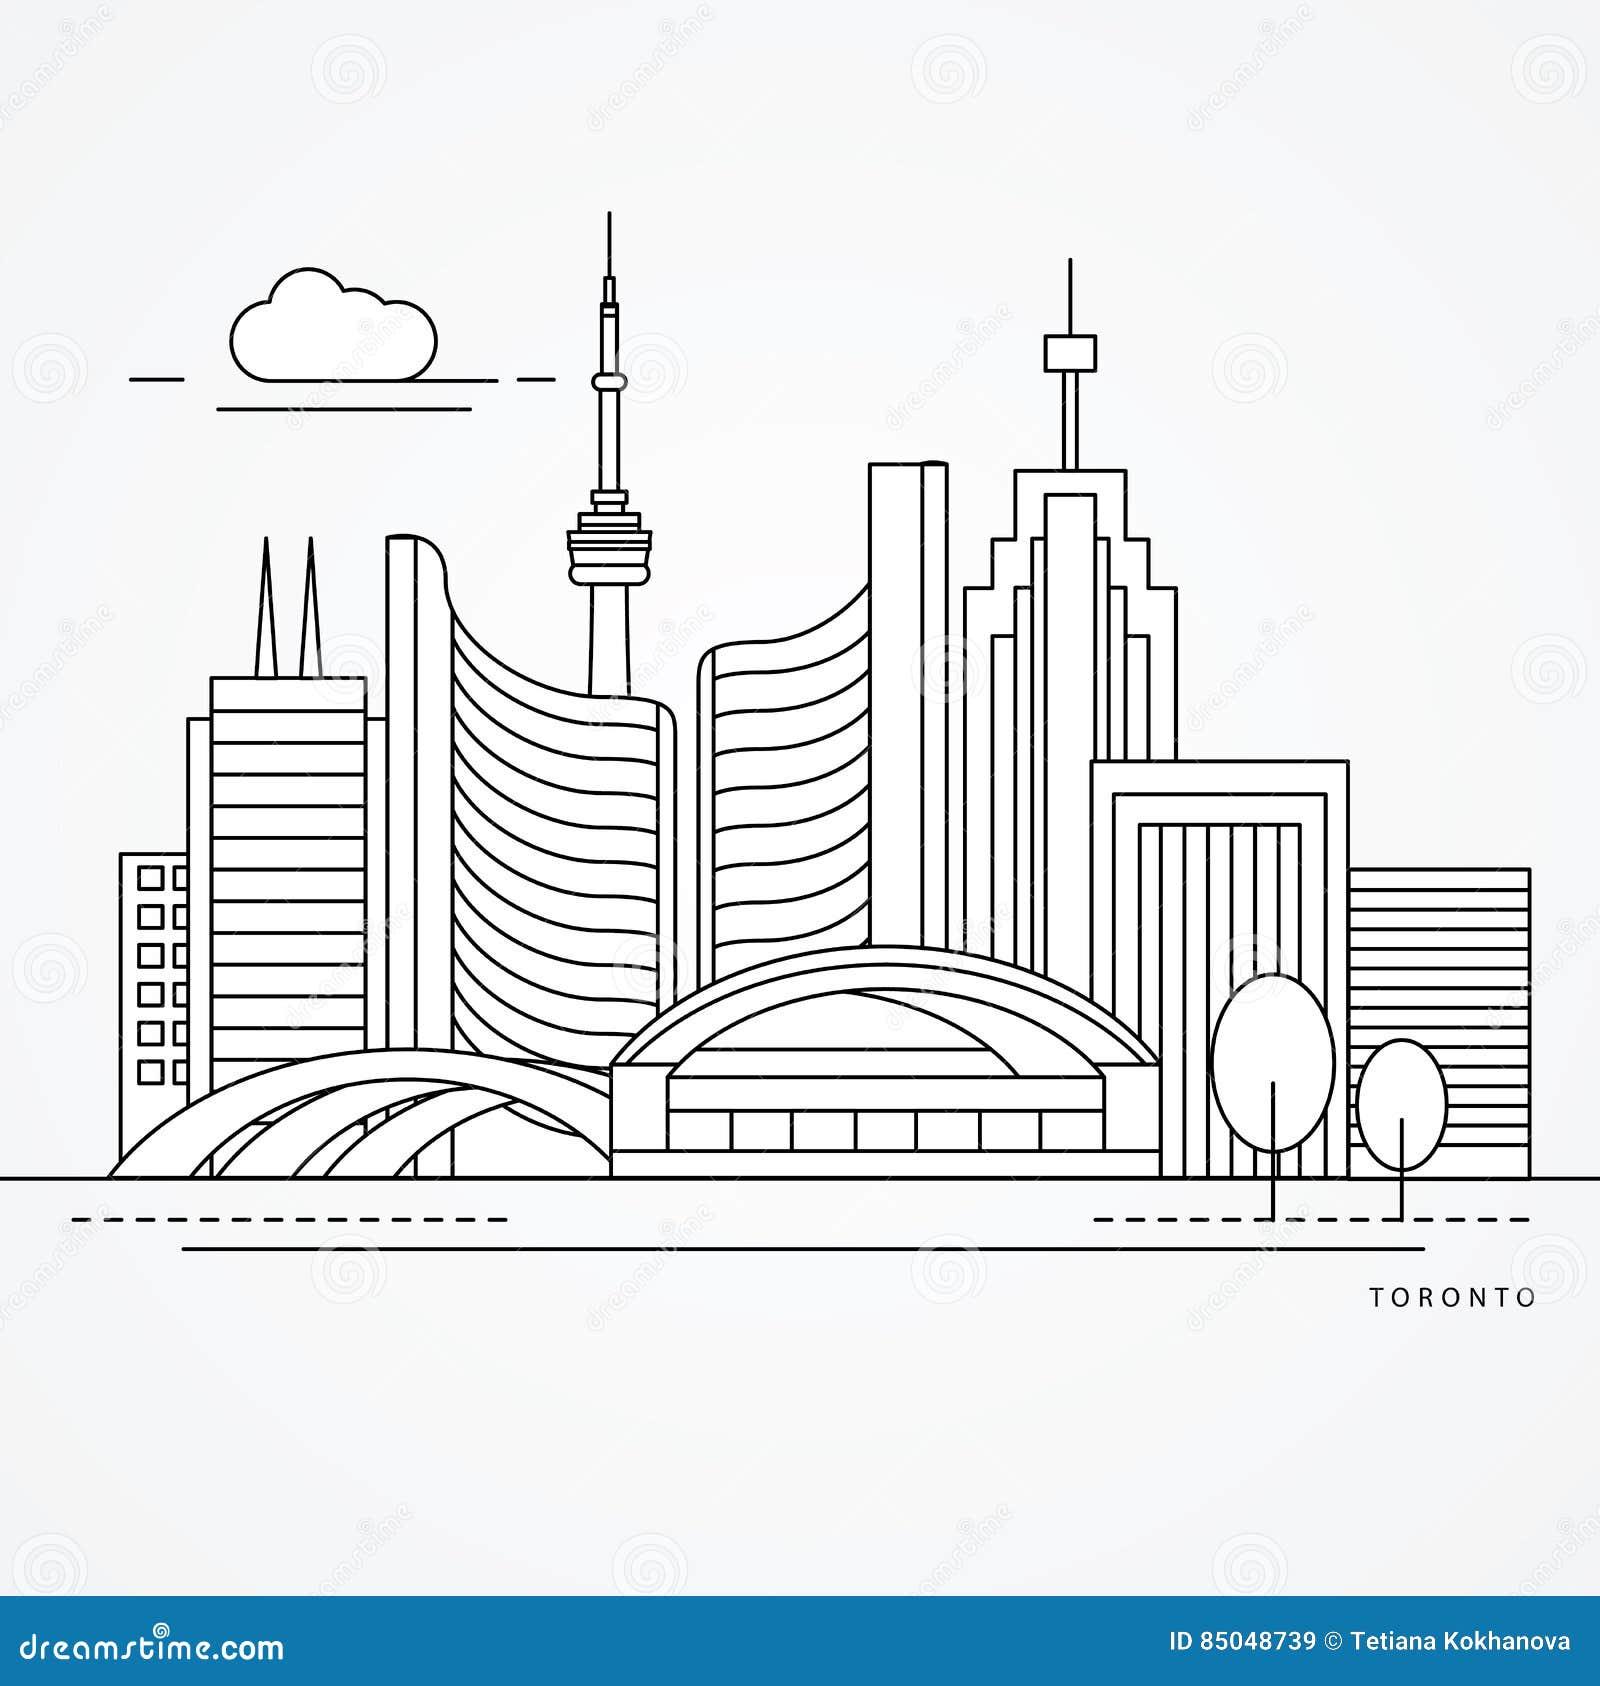 Linear illustration of Toronto, Canada. Flat one line style. Trendy vector illustration